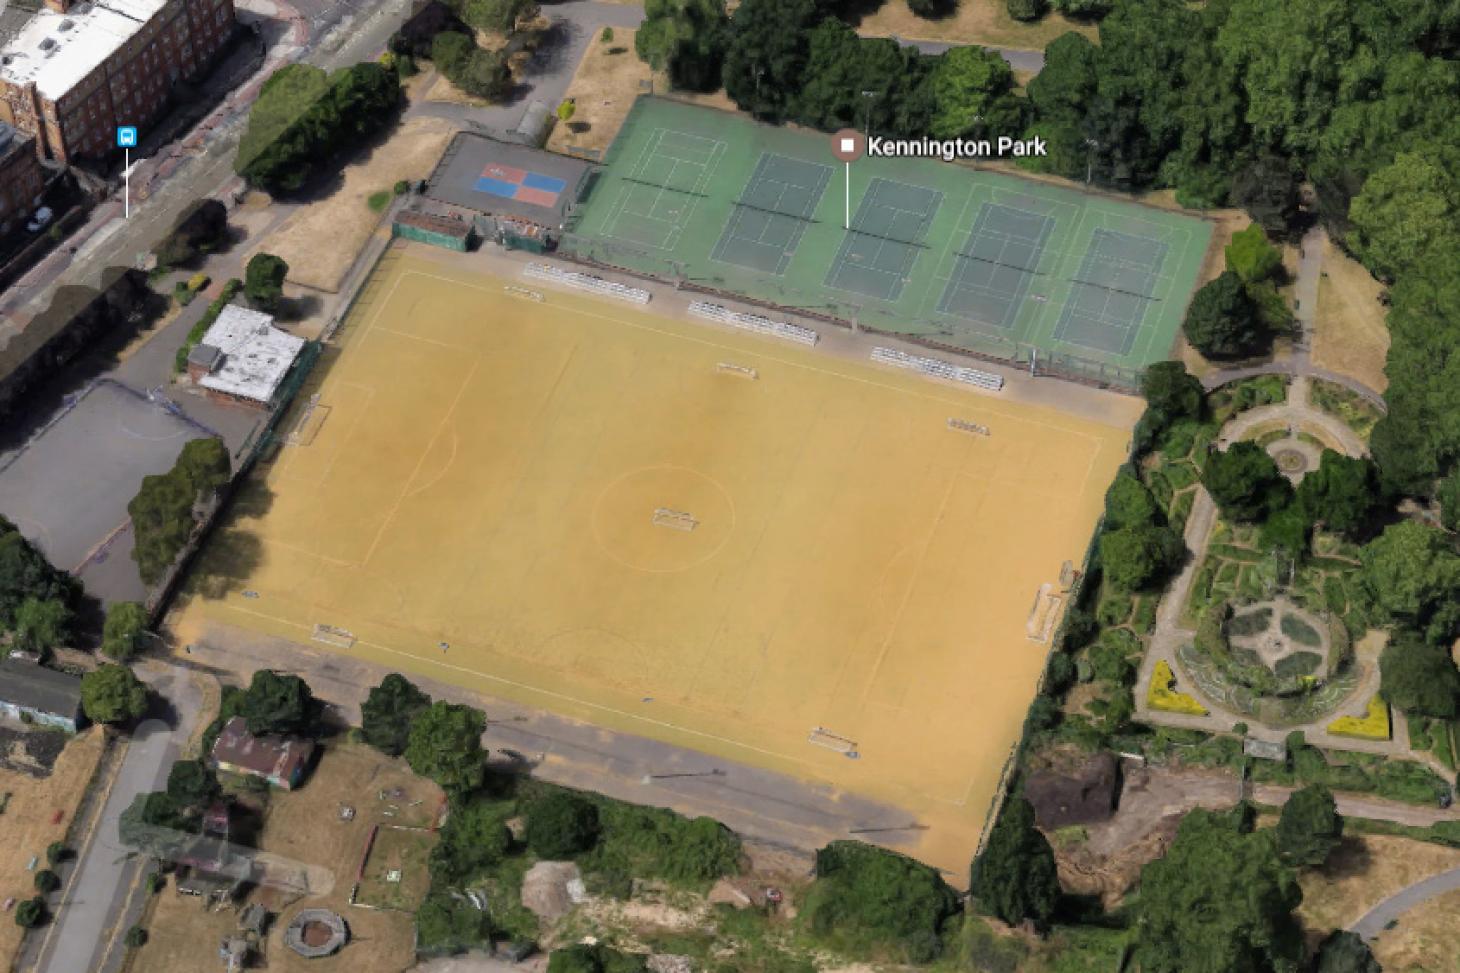 Kennington Park 11 a side | Astroturf football pitch